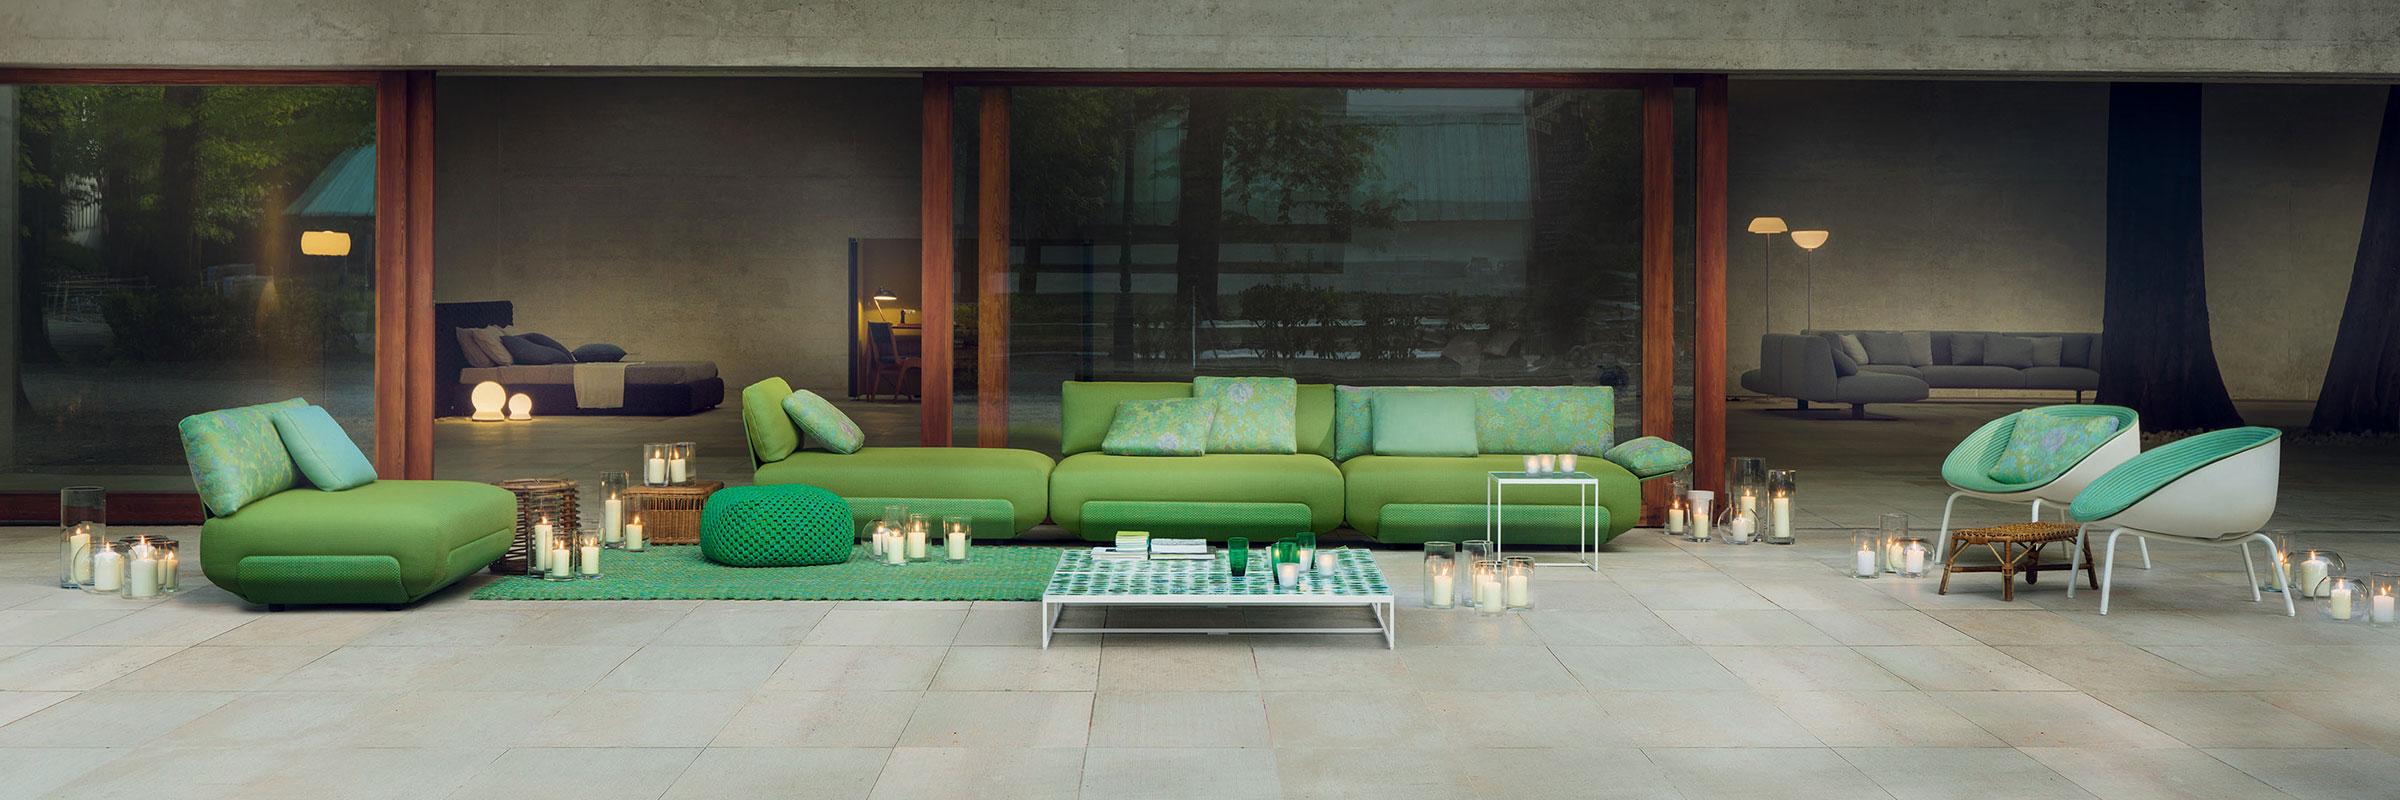 hauser-design-paola-lenti-sofa-kollektion-in-grün